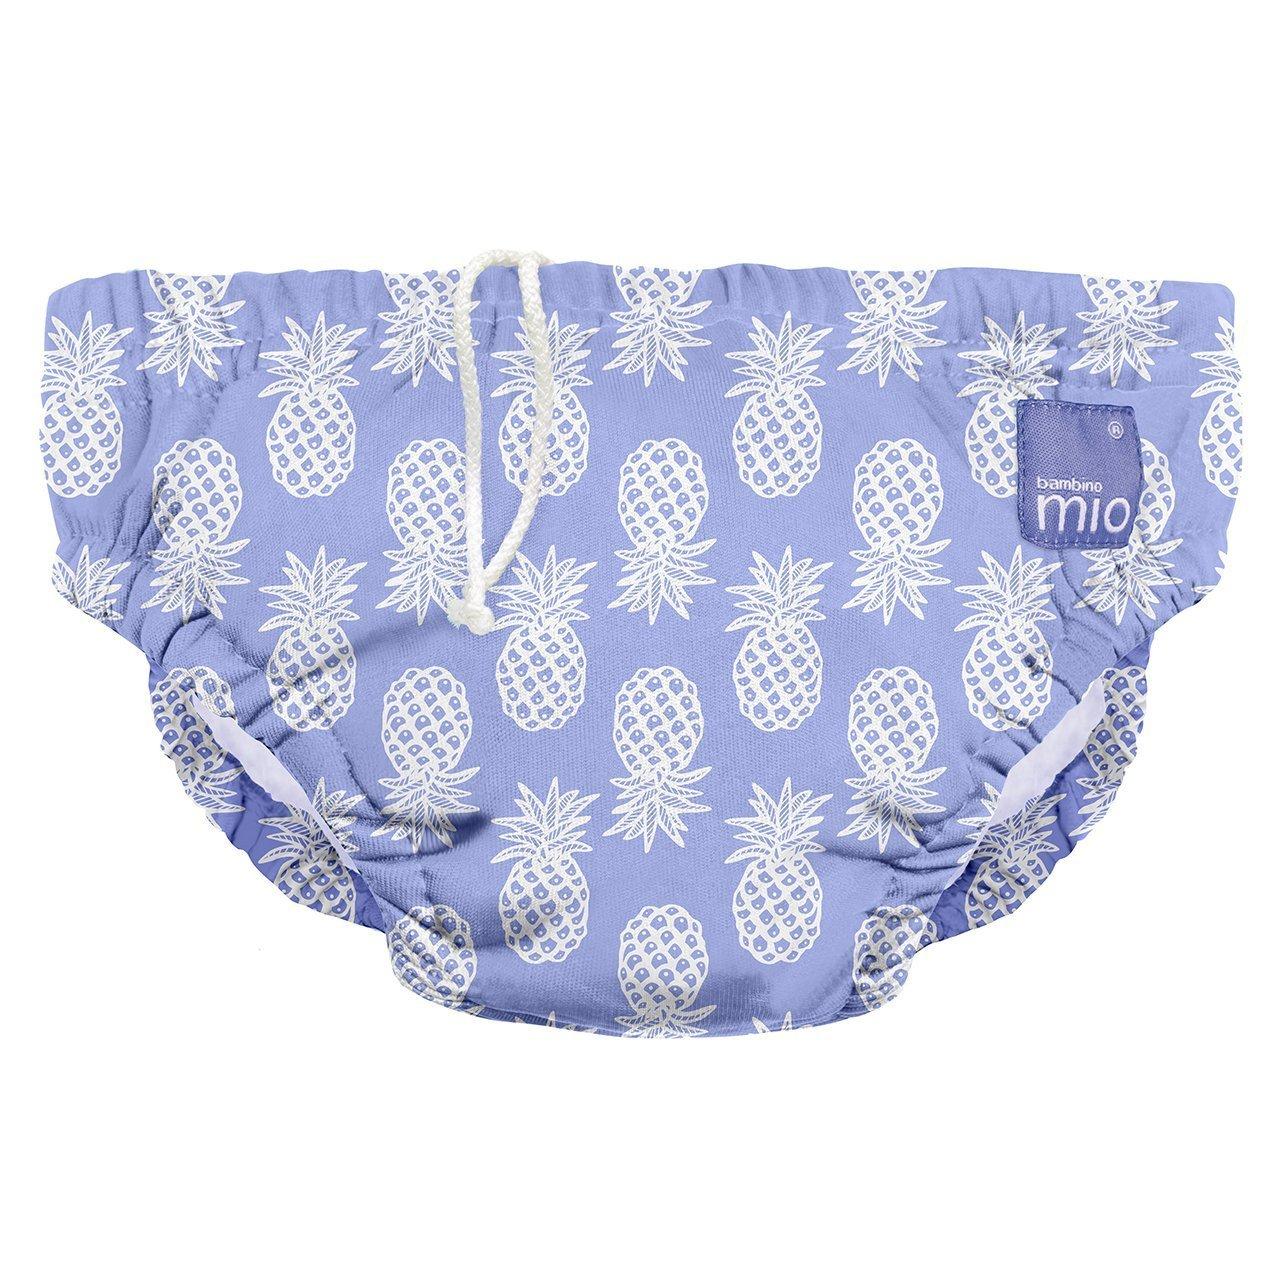 Bambino Mio Large Reusable Swim Nappy Blue Tail Multicolour 1-2 Years